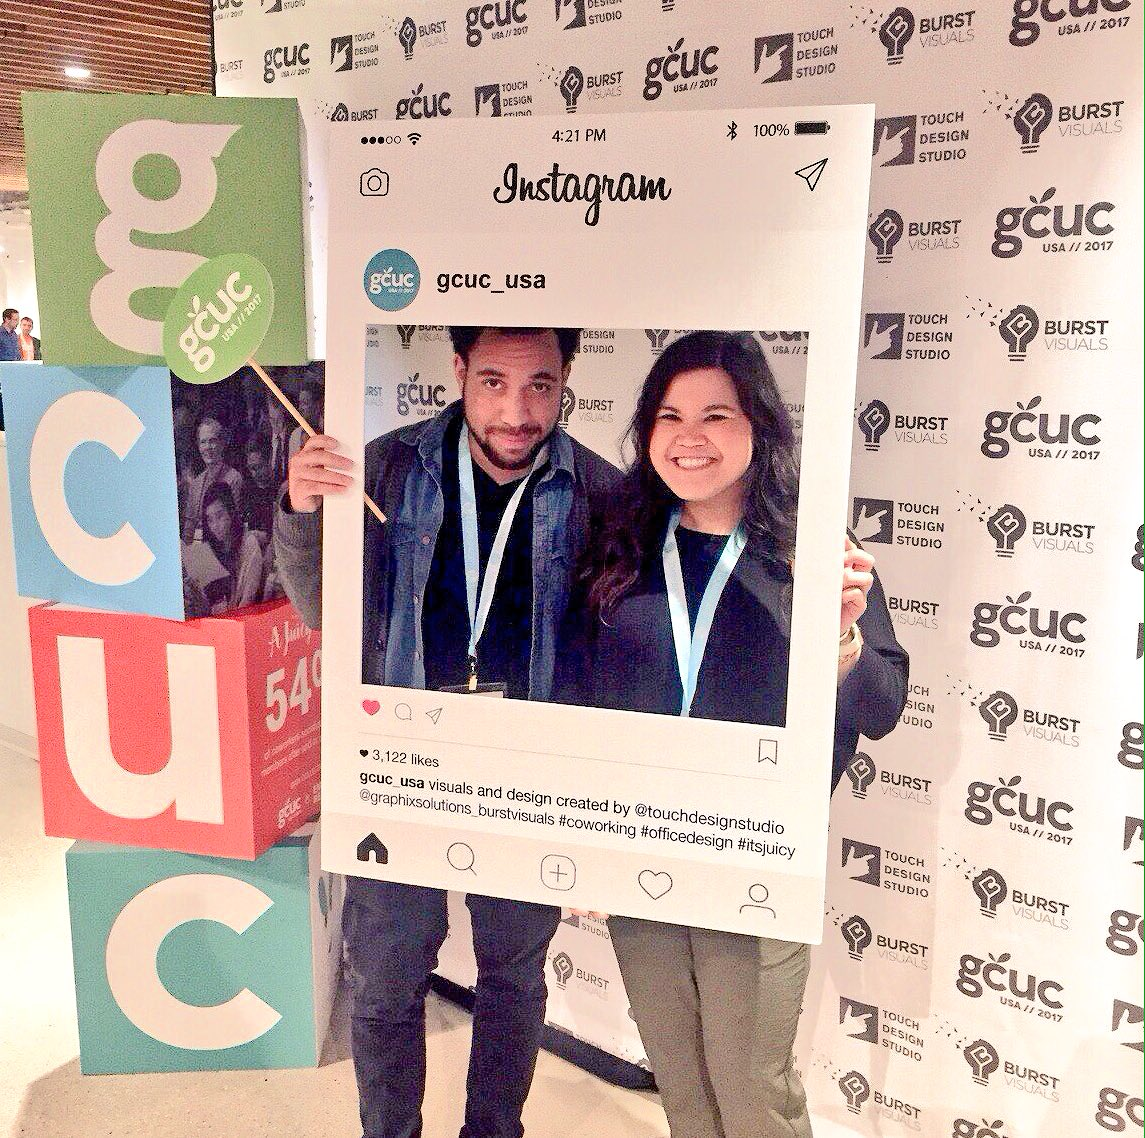 We had a blast @GCUCUSA 🙌🏽#gcuc #gcuc2017 #coworking #unconference @Convene https://t.co/cSO3WxZ4QK